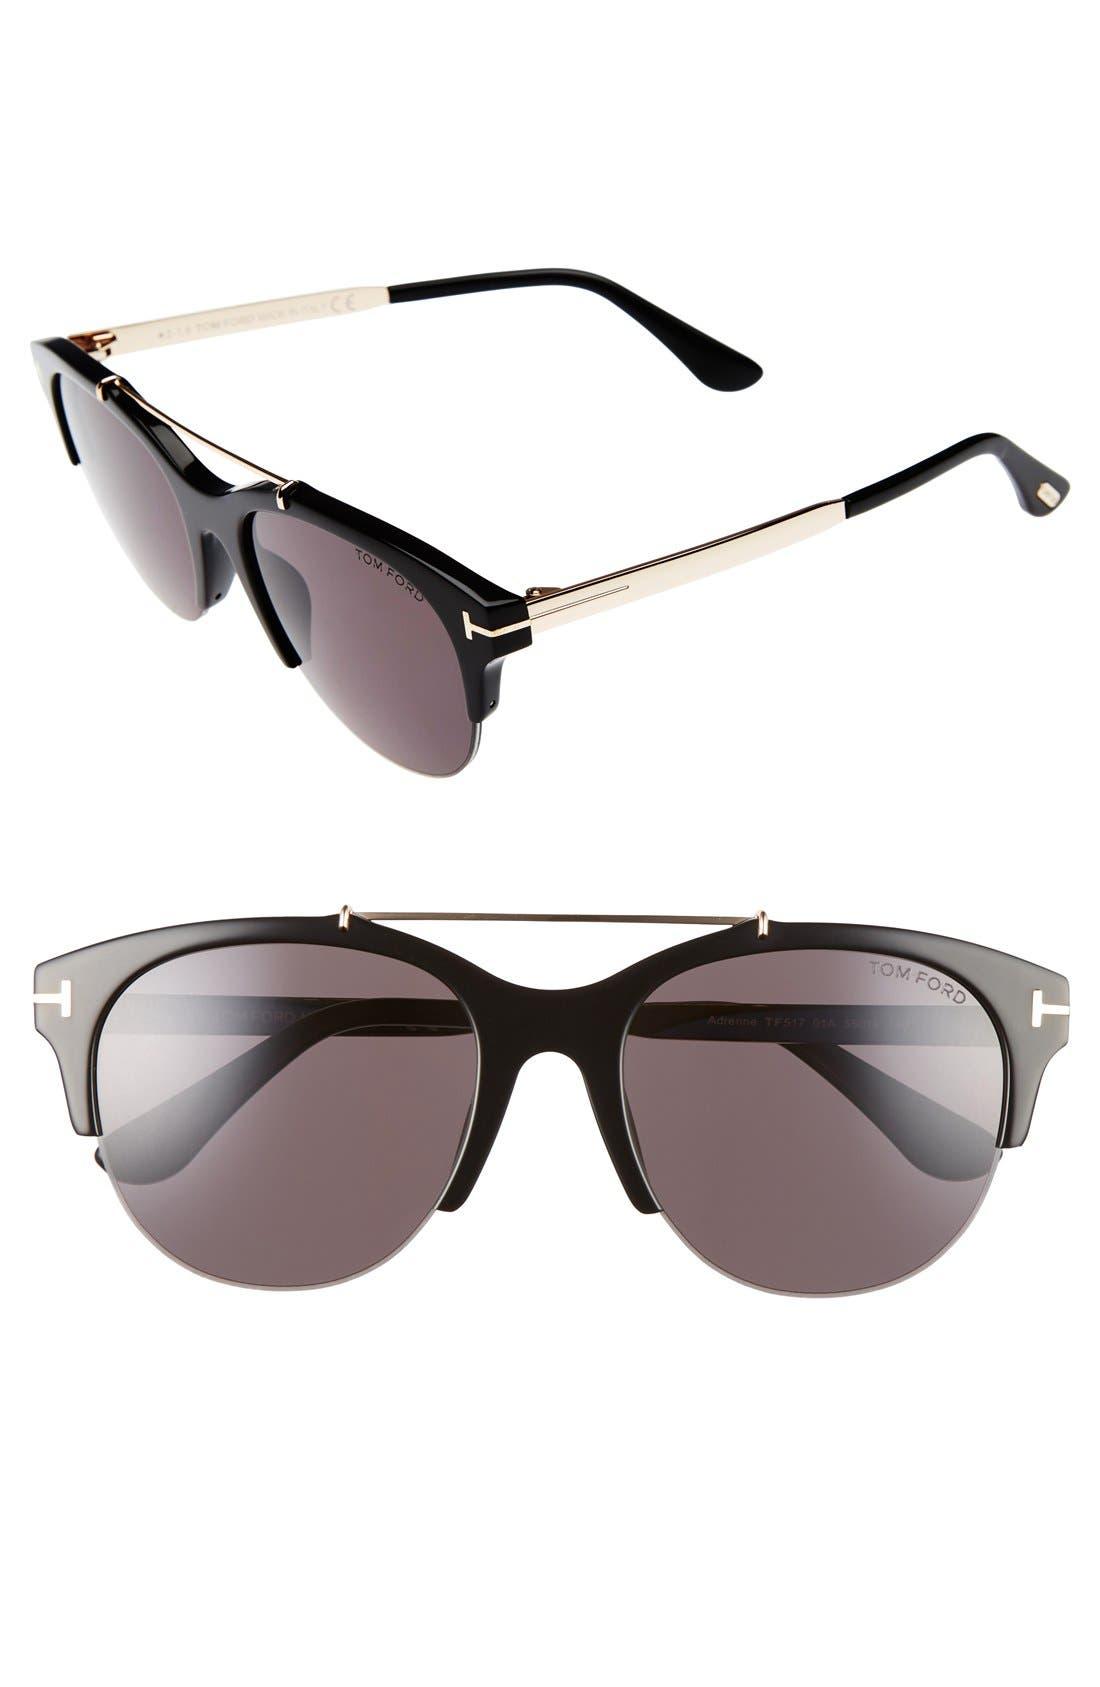 Main Image - Tom Ford Adrenne 55mm Sunglasses